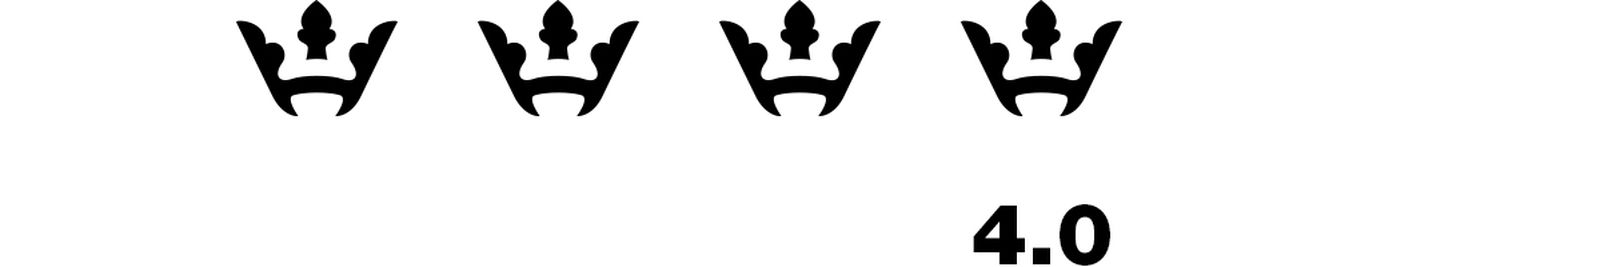 4.0 nicki minaj queen